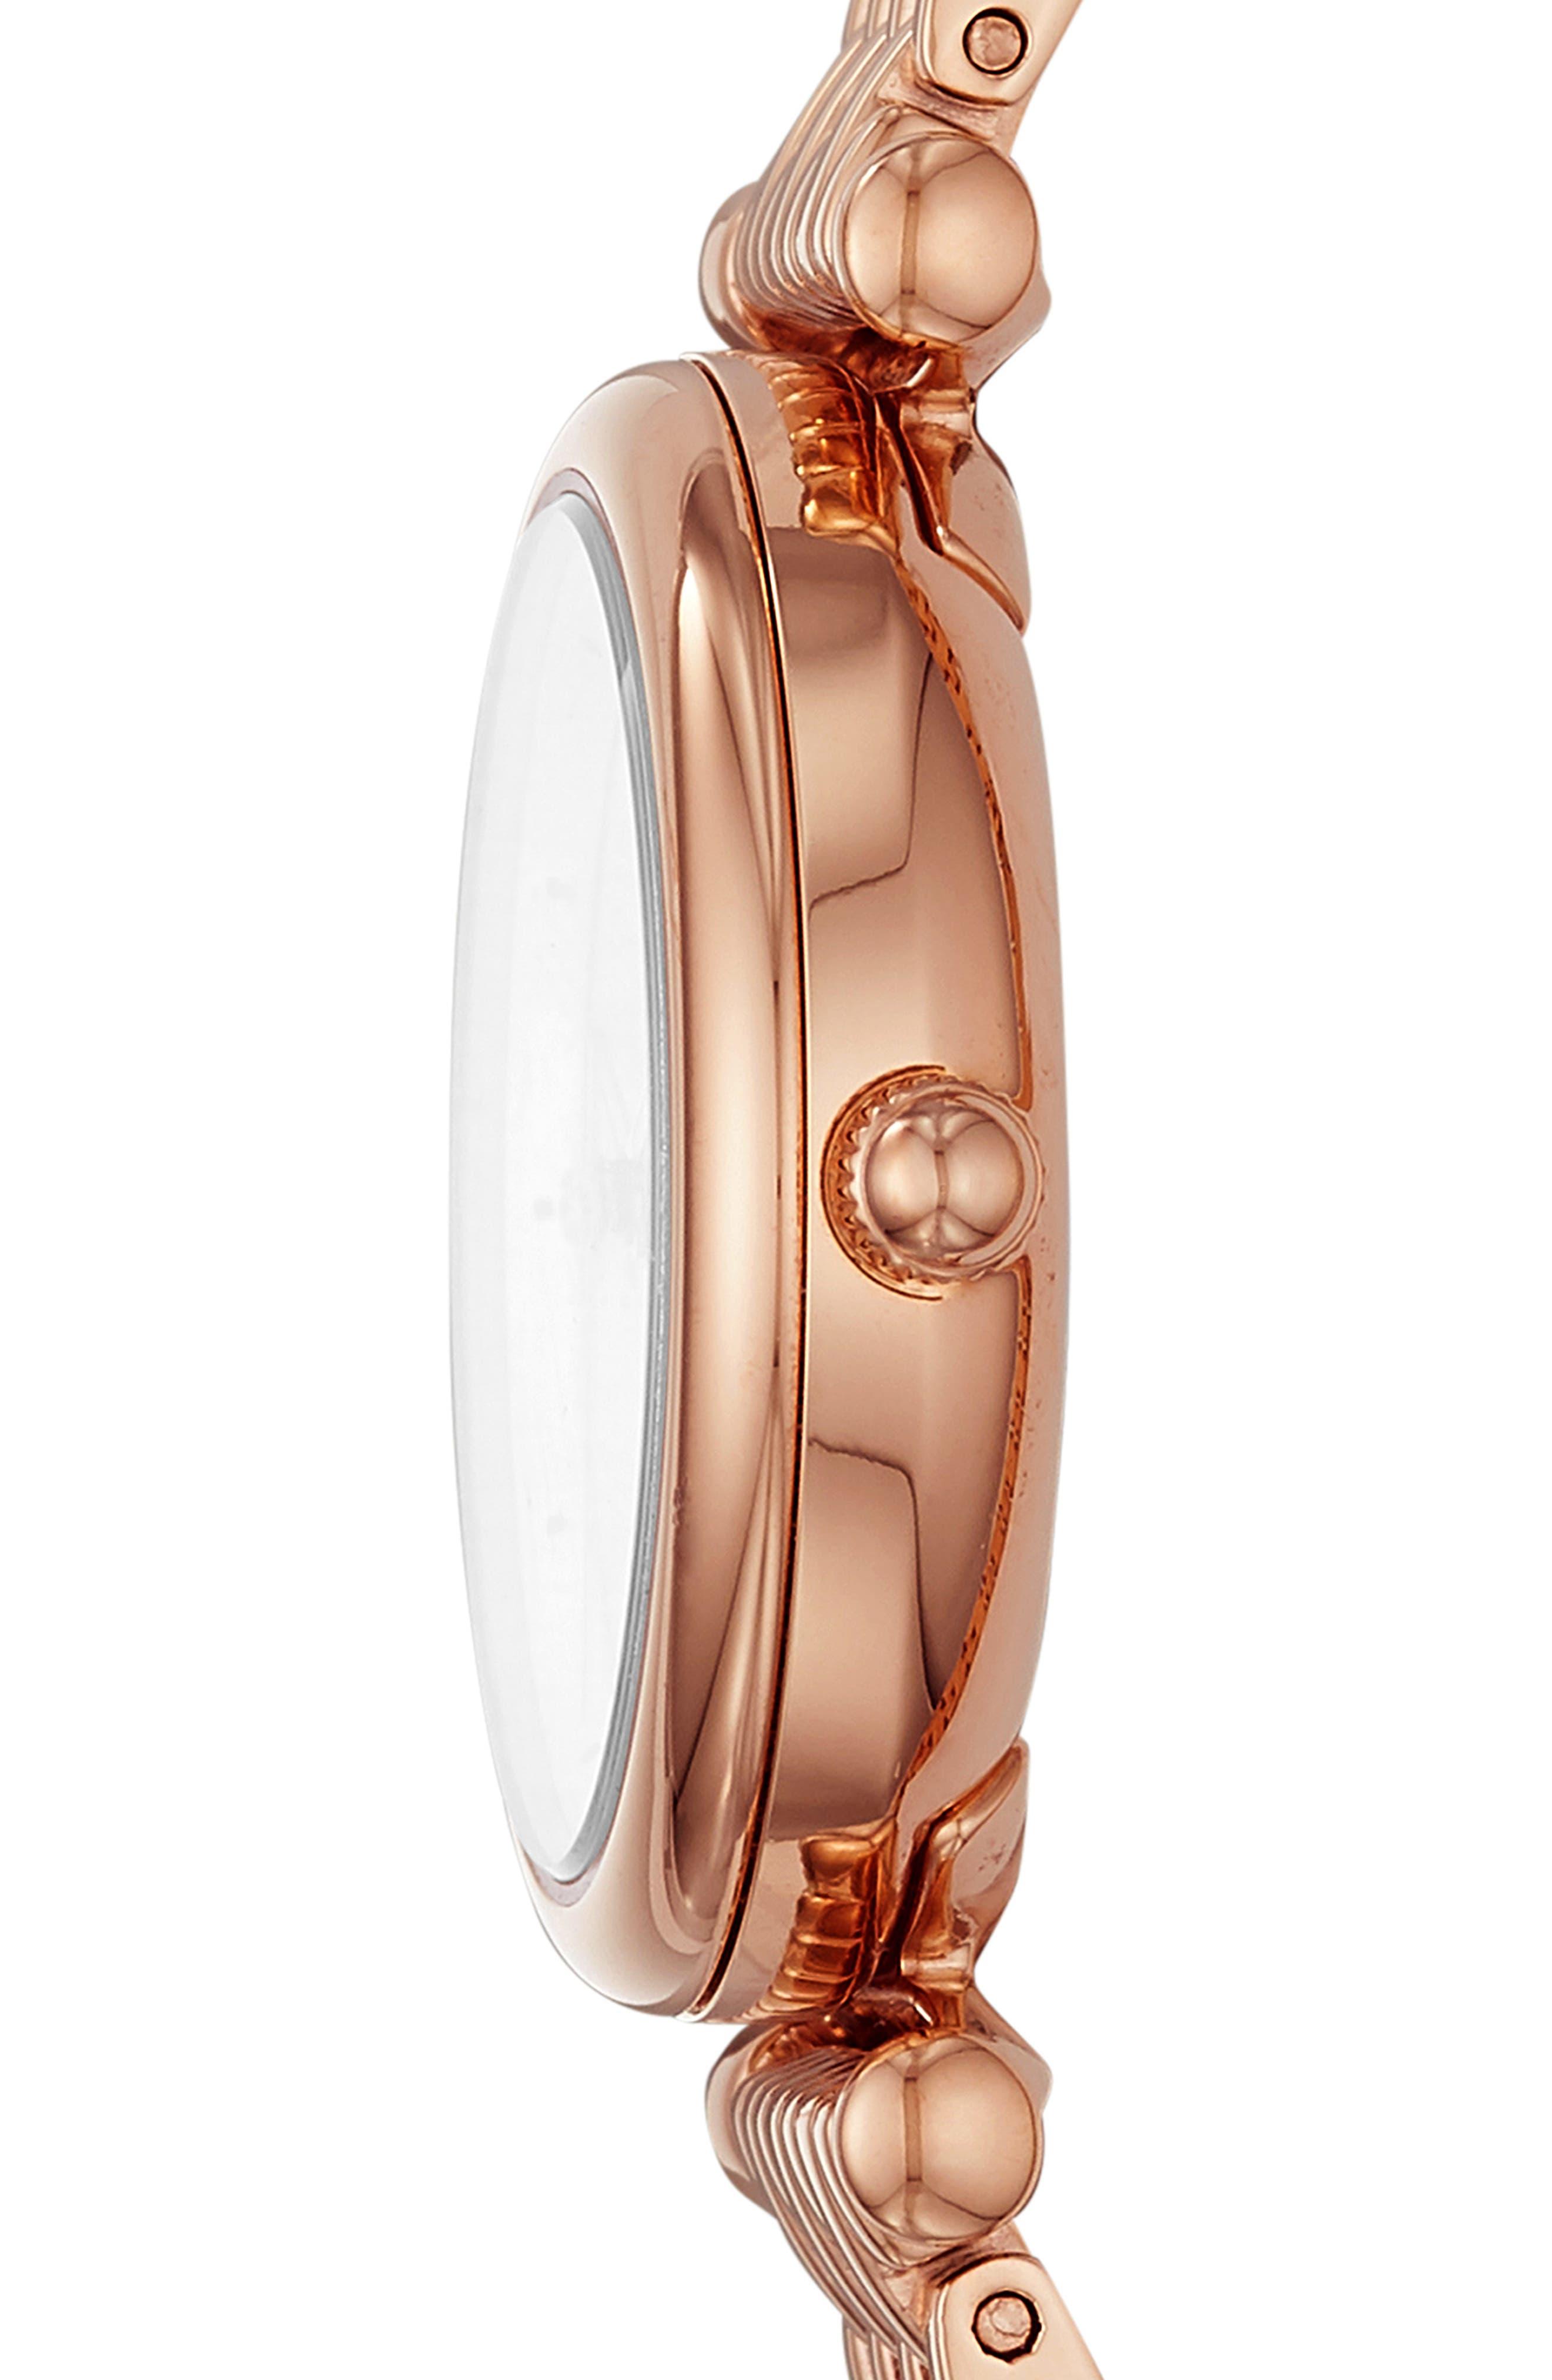 FOSSIL, Mini Carlie Bracelet Watch, 29mm, Alternate thumbnail 2, color, ROSEGOLD/MOTHER PEARL/ROSEGOLD